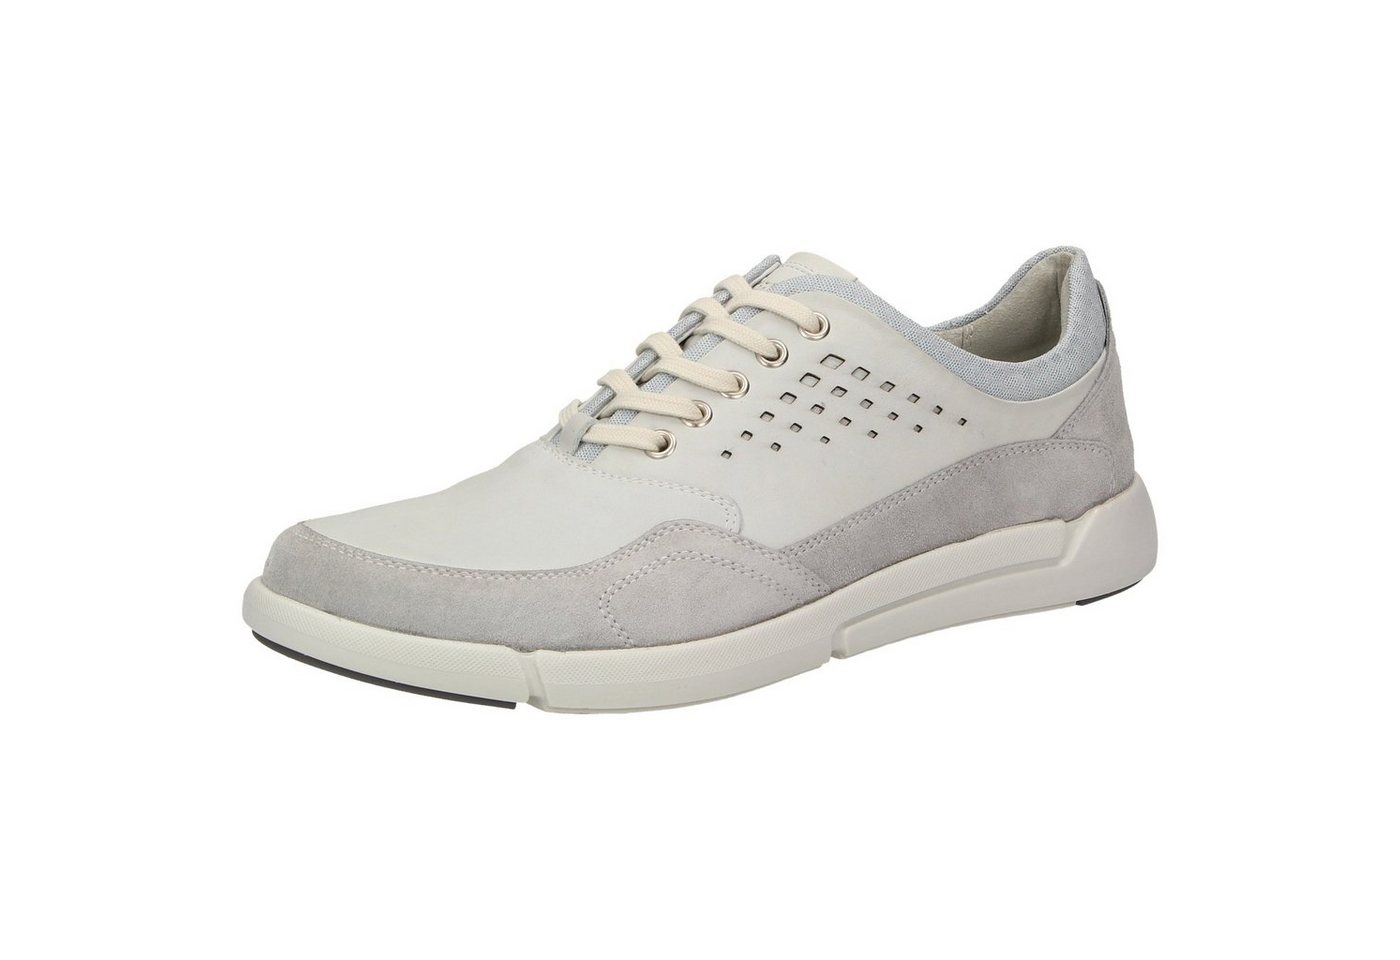 Herren SIOUX Rumo Sneaker grau   04054765394399